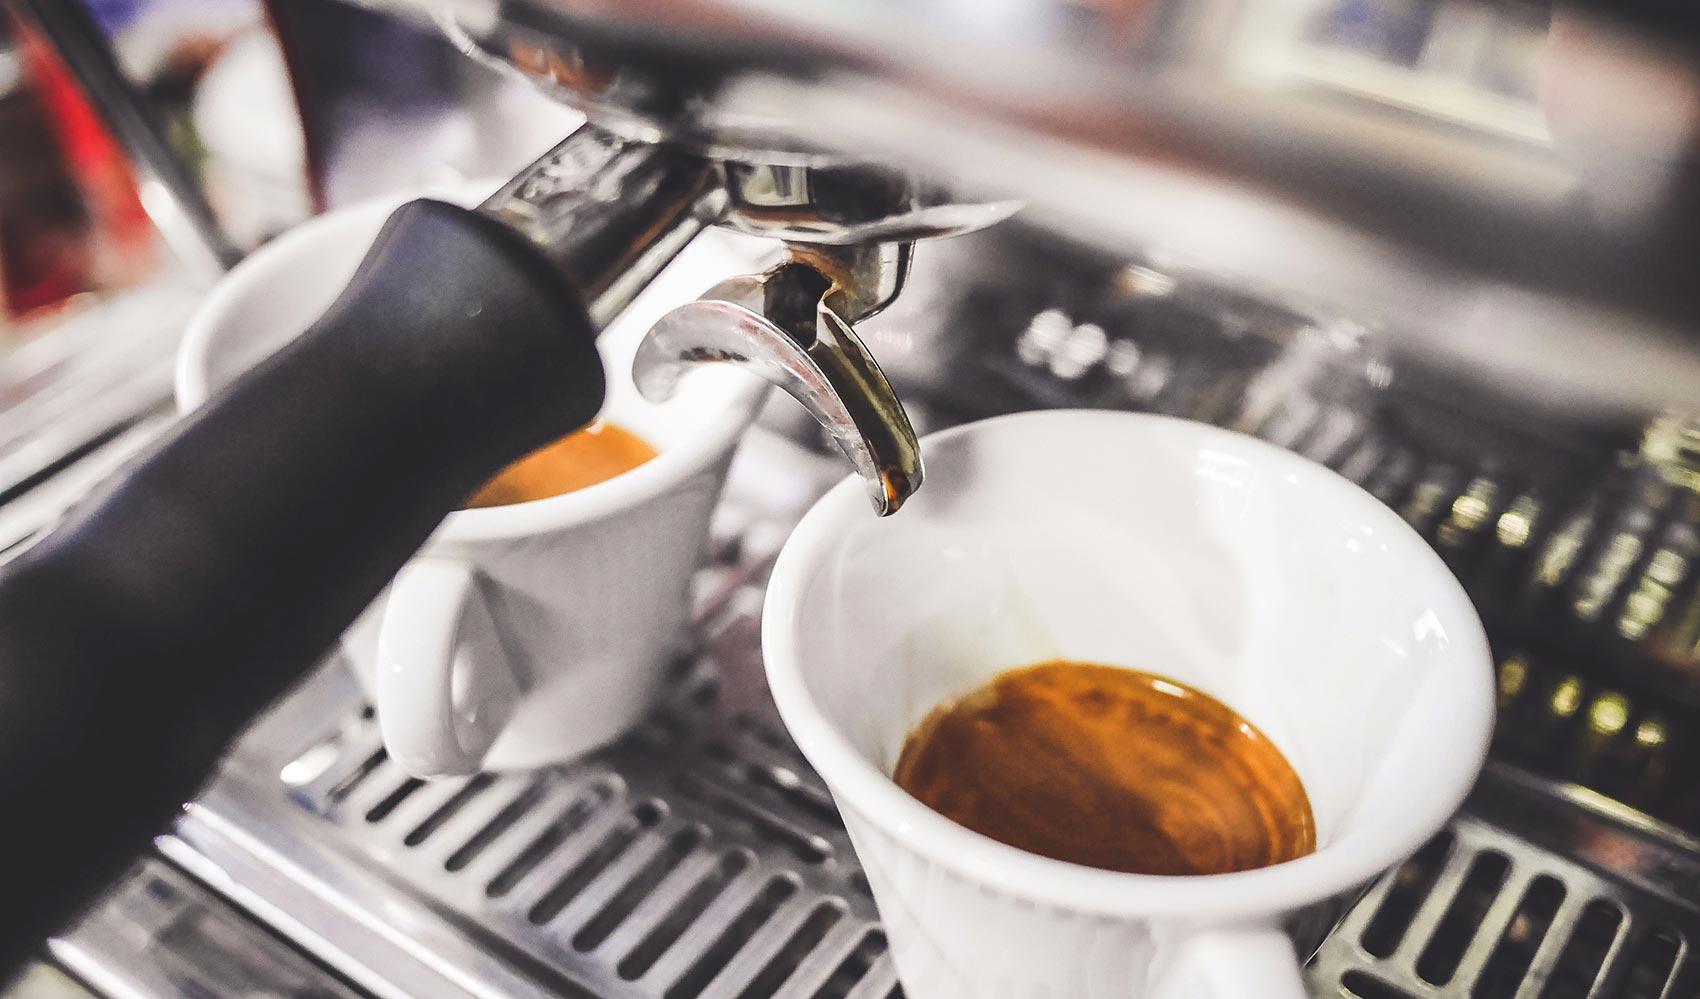 Die italienische Kaffeekultur. CafCaf.de – Kaffee & Blog, Kaffeeblog